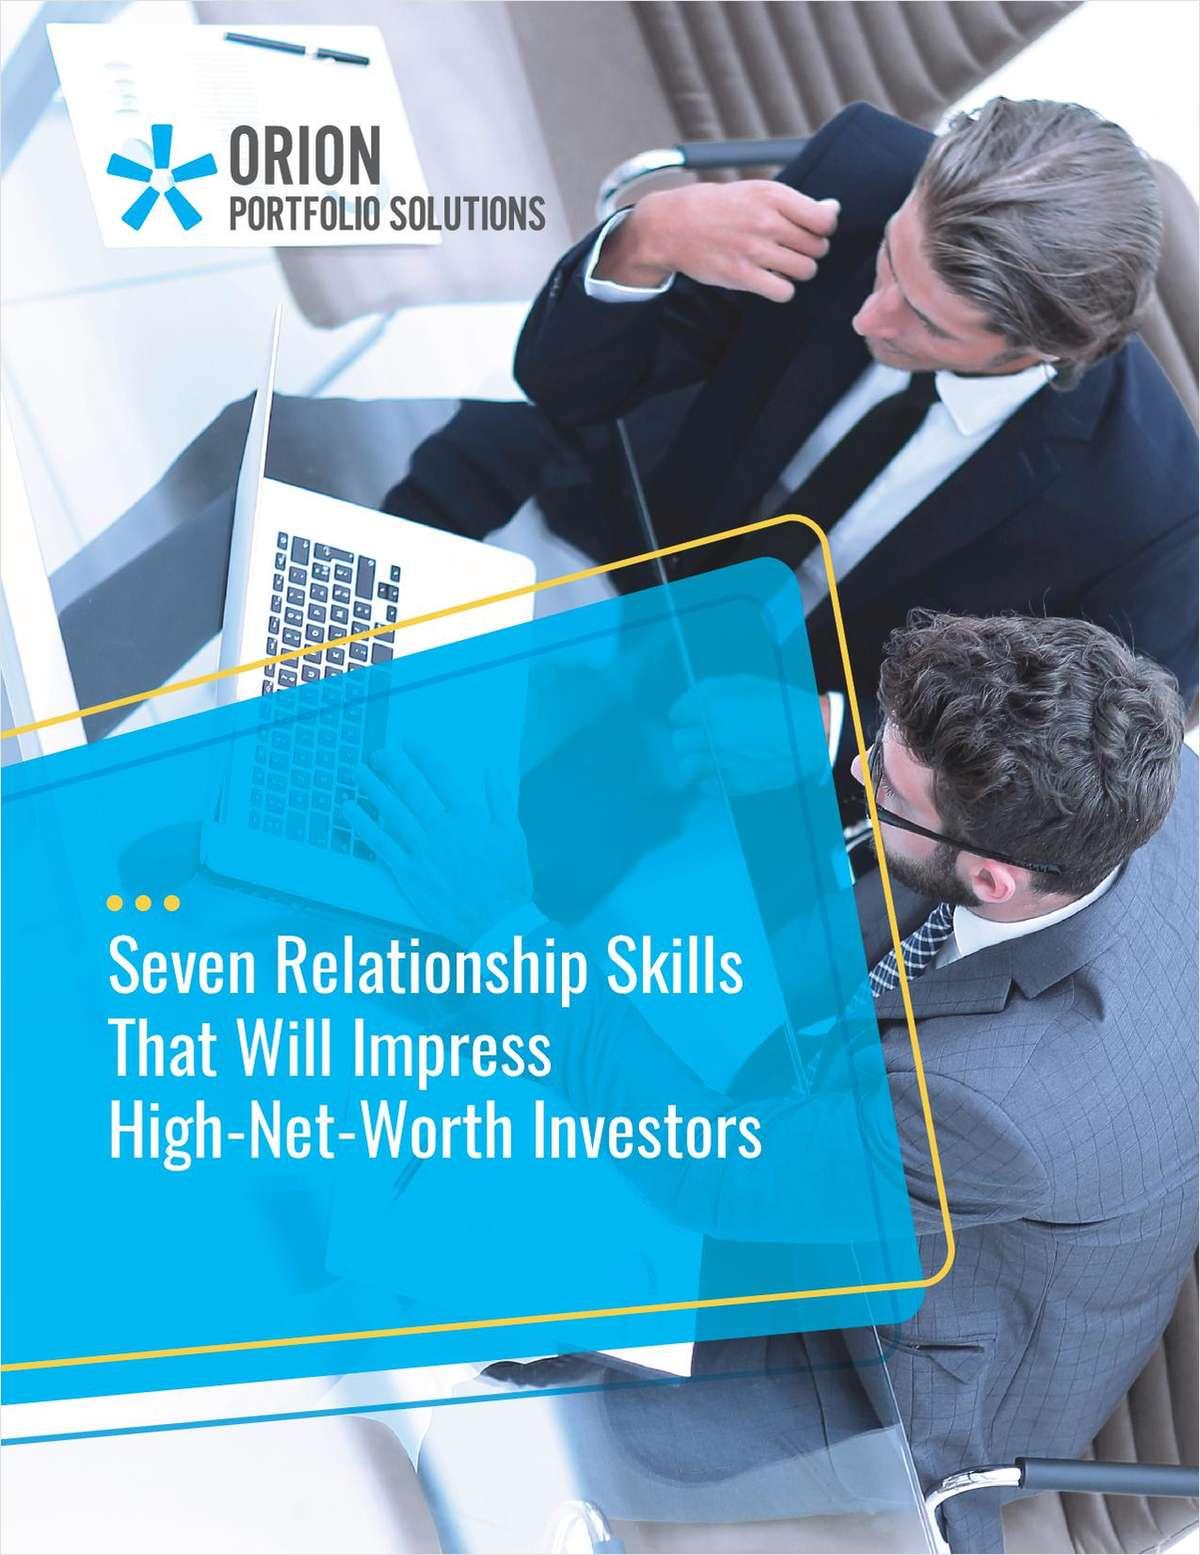 Seven Relationship Skills That Will Impress High-Net-Worth Investors